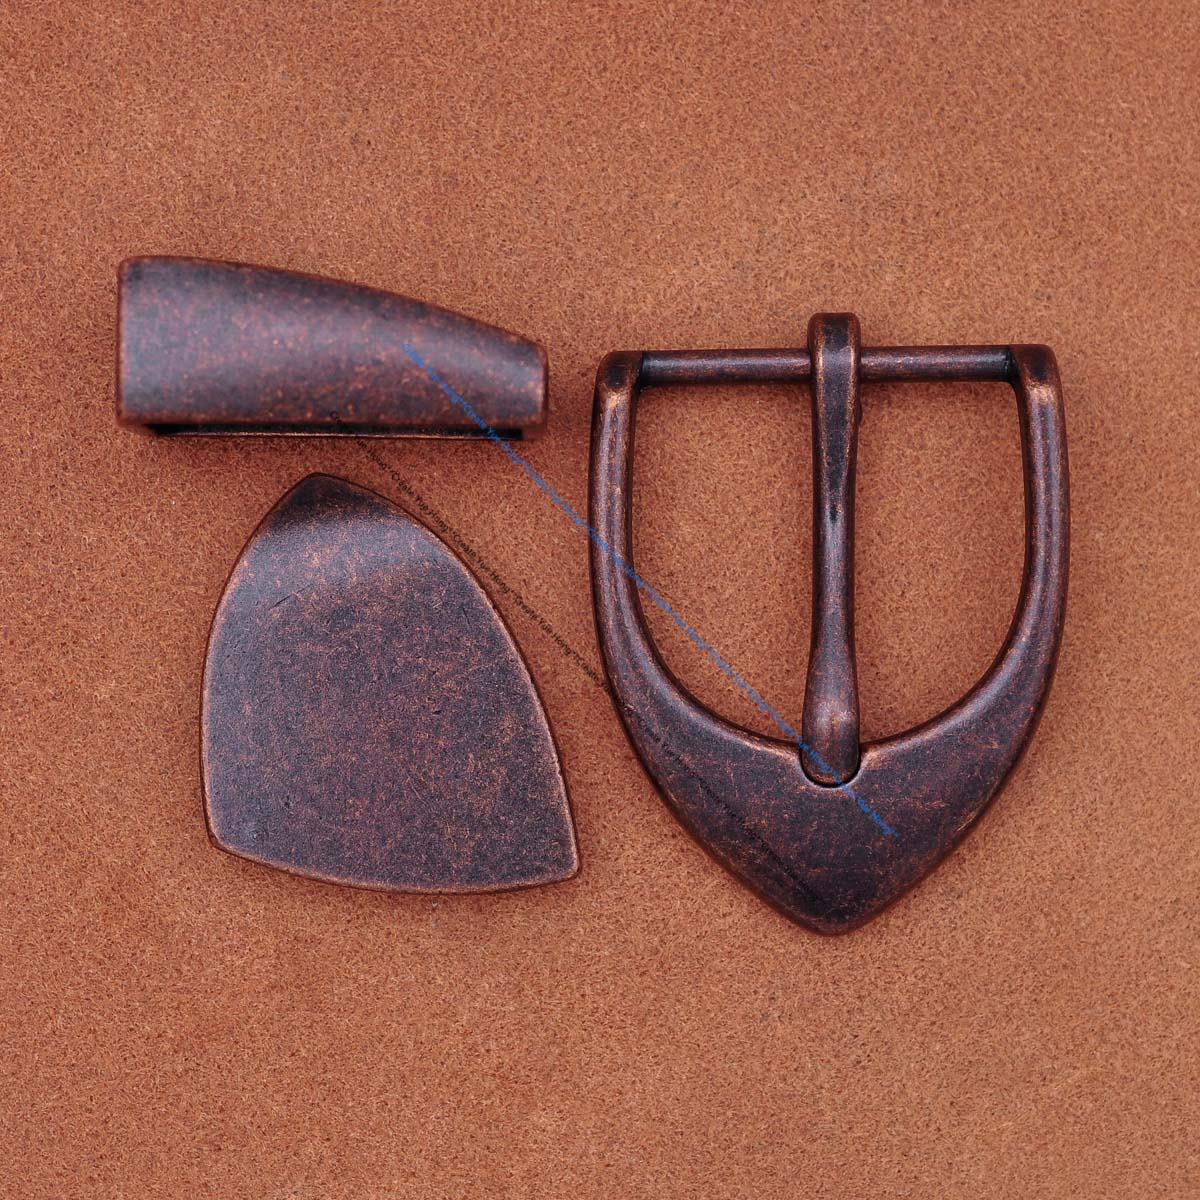 Heavy Sturdy  Western COOL Vintage Copper 3PCS SET Single Prong Pin Quality Leather Belt Buckle Fit 30mm Belt Str